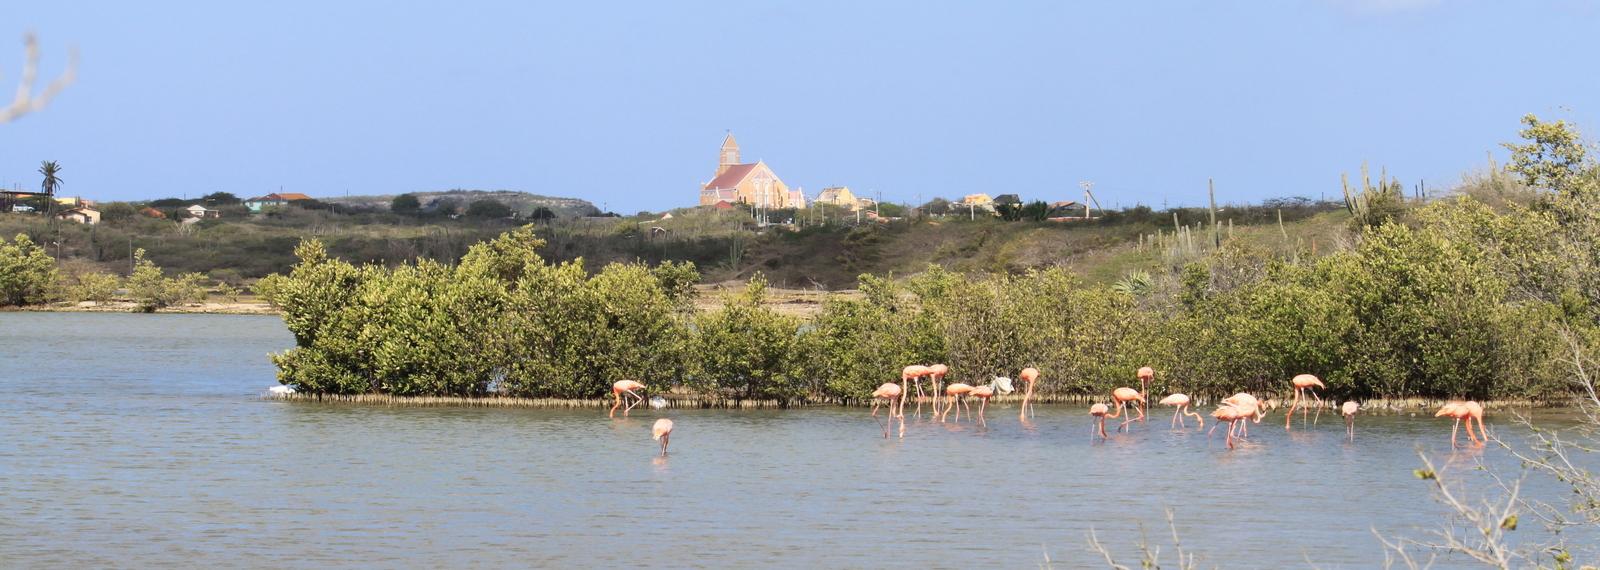 Flamingo, St Willibrordus